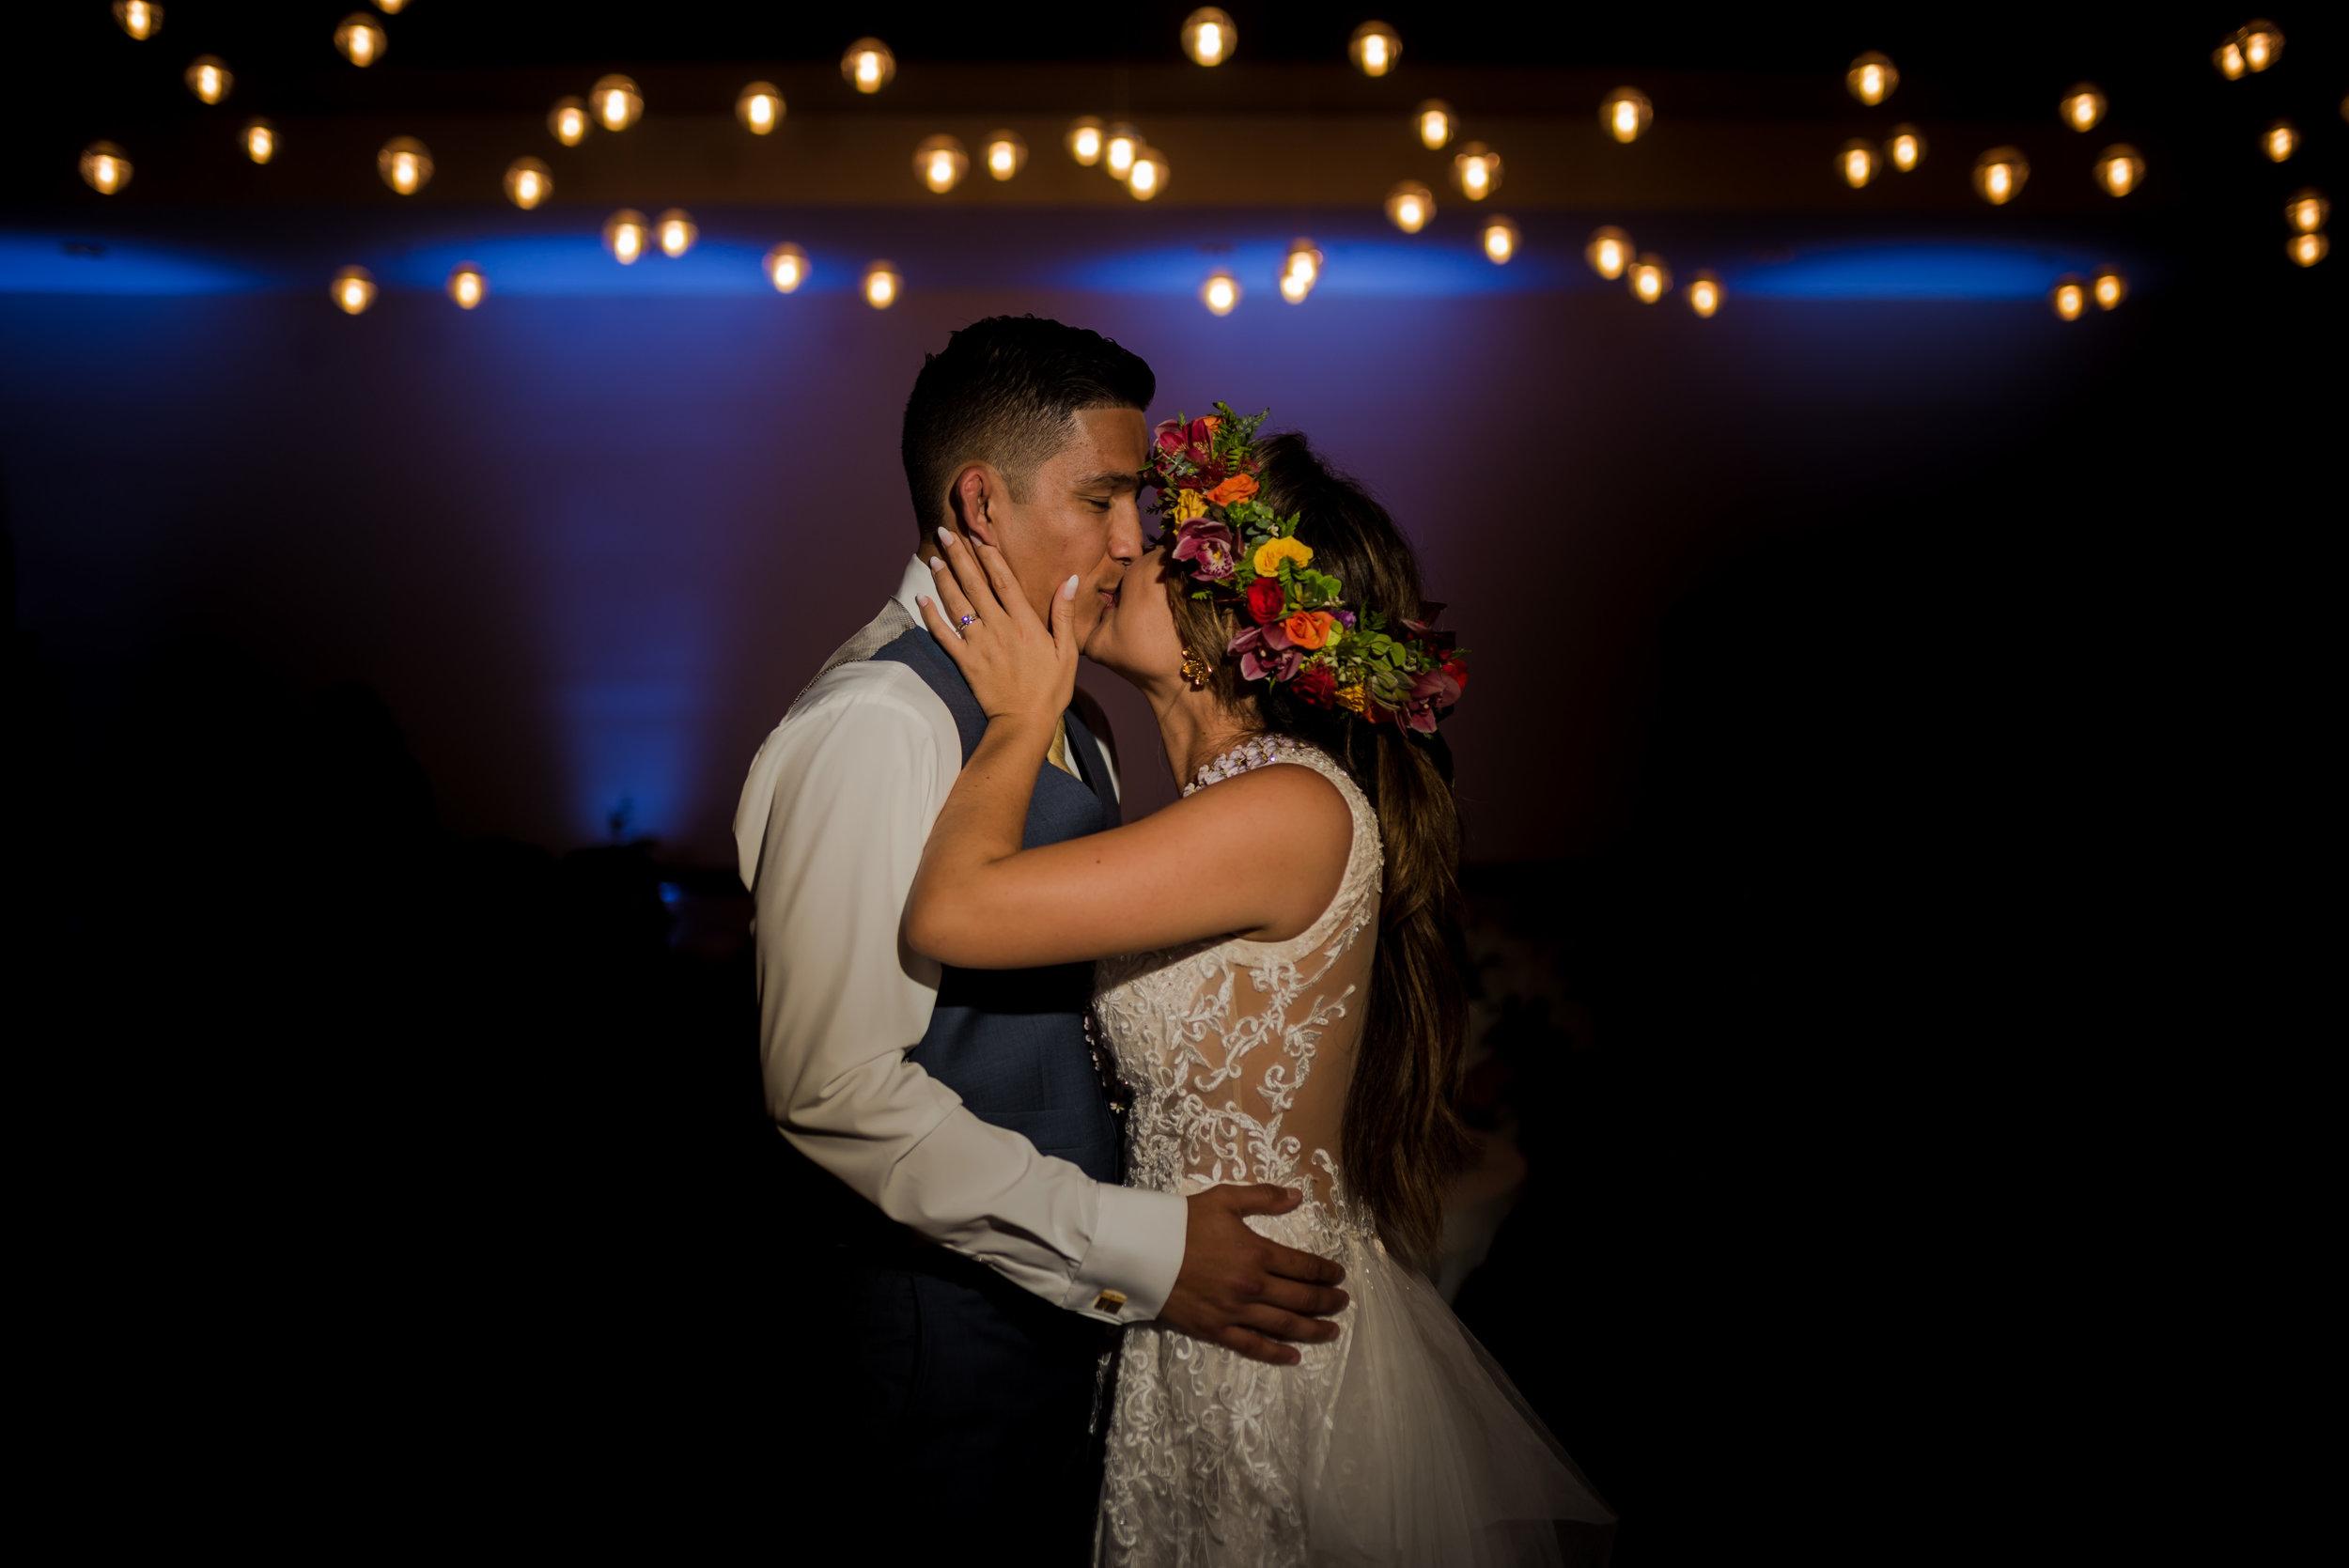 kaui-vince-centepoint-club-wedding-playa-vista-3.jpg